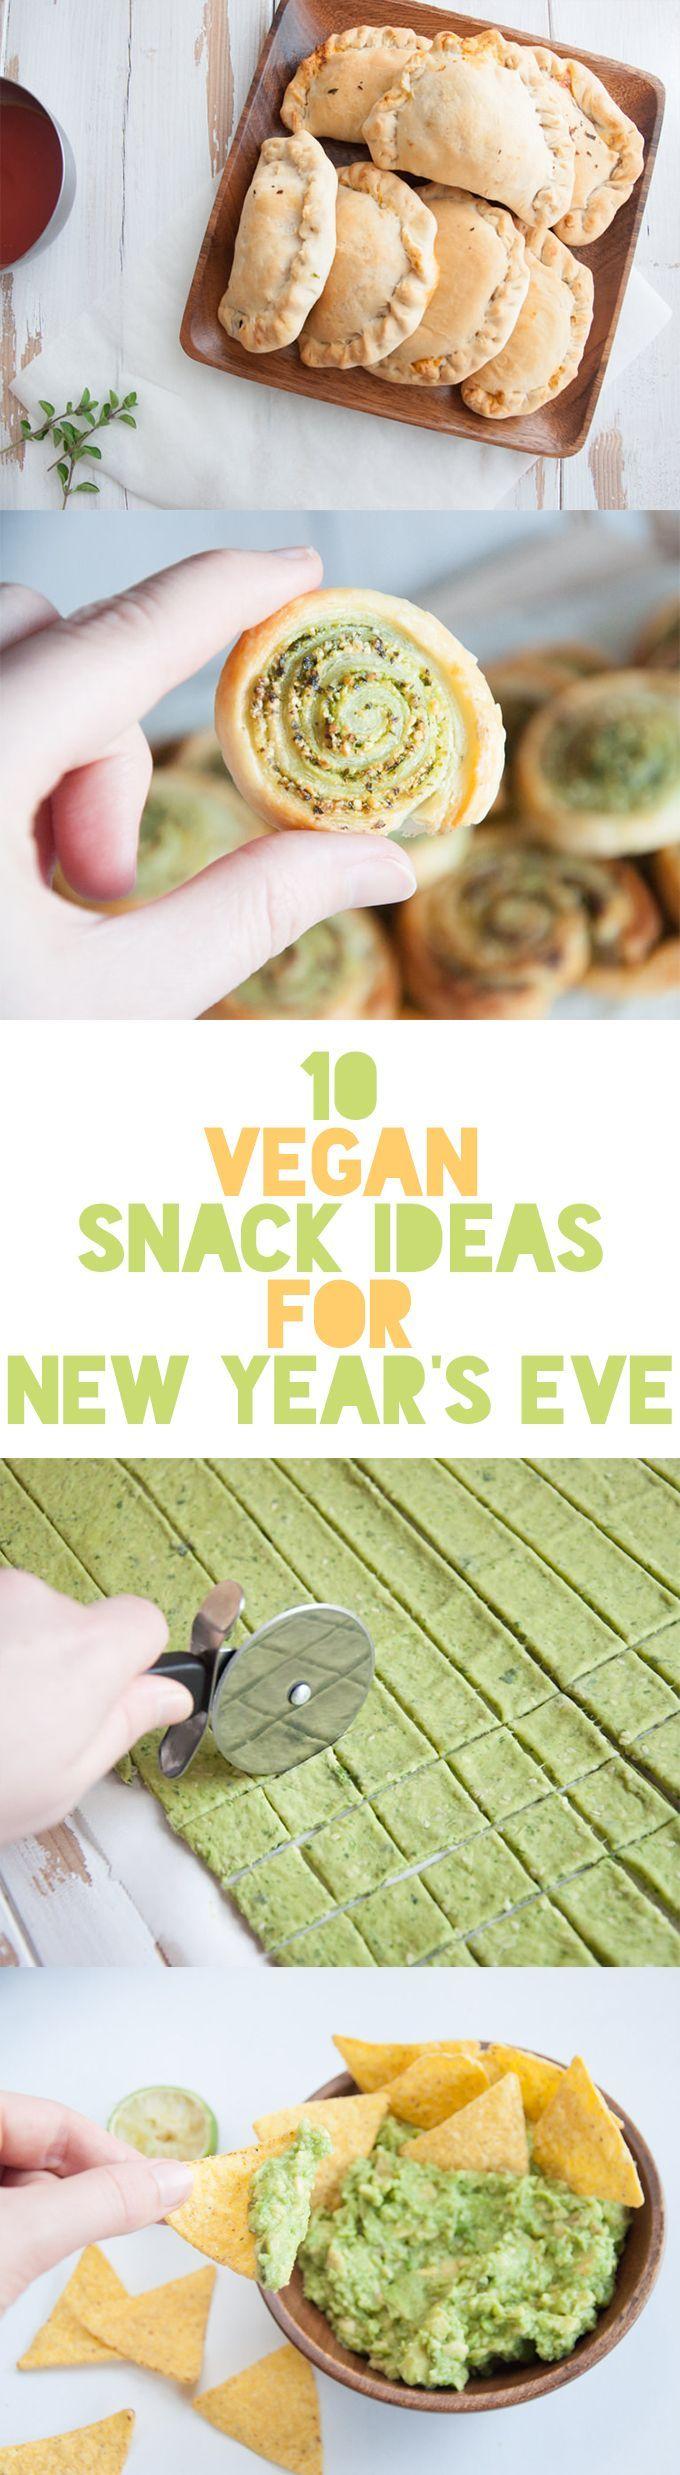 10 Vegan Snacks For New Year S Eve Elephantastic Vegan Vegan Snacks Vegan Party Food Vegan Appetizers